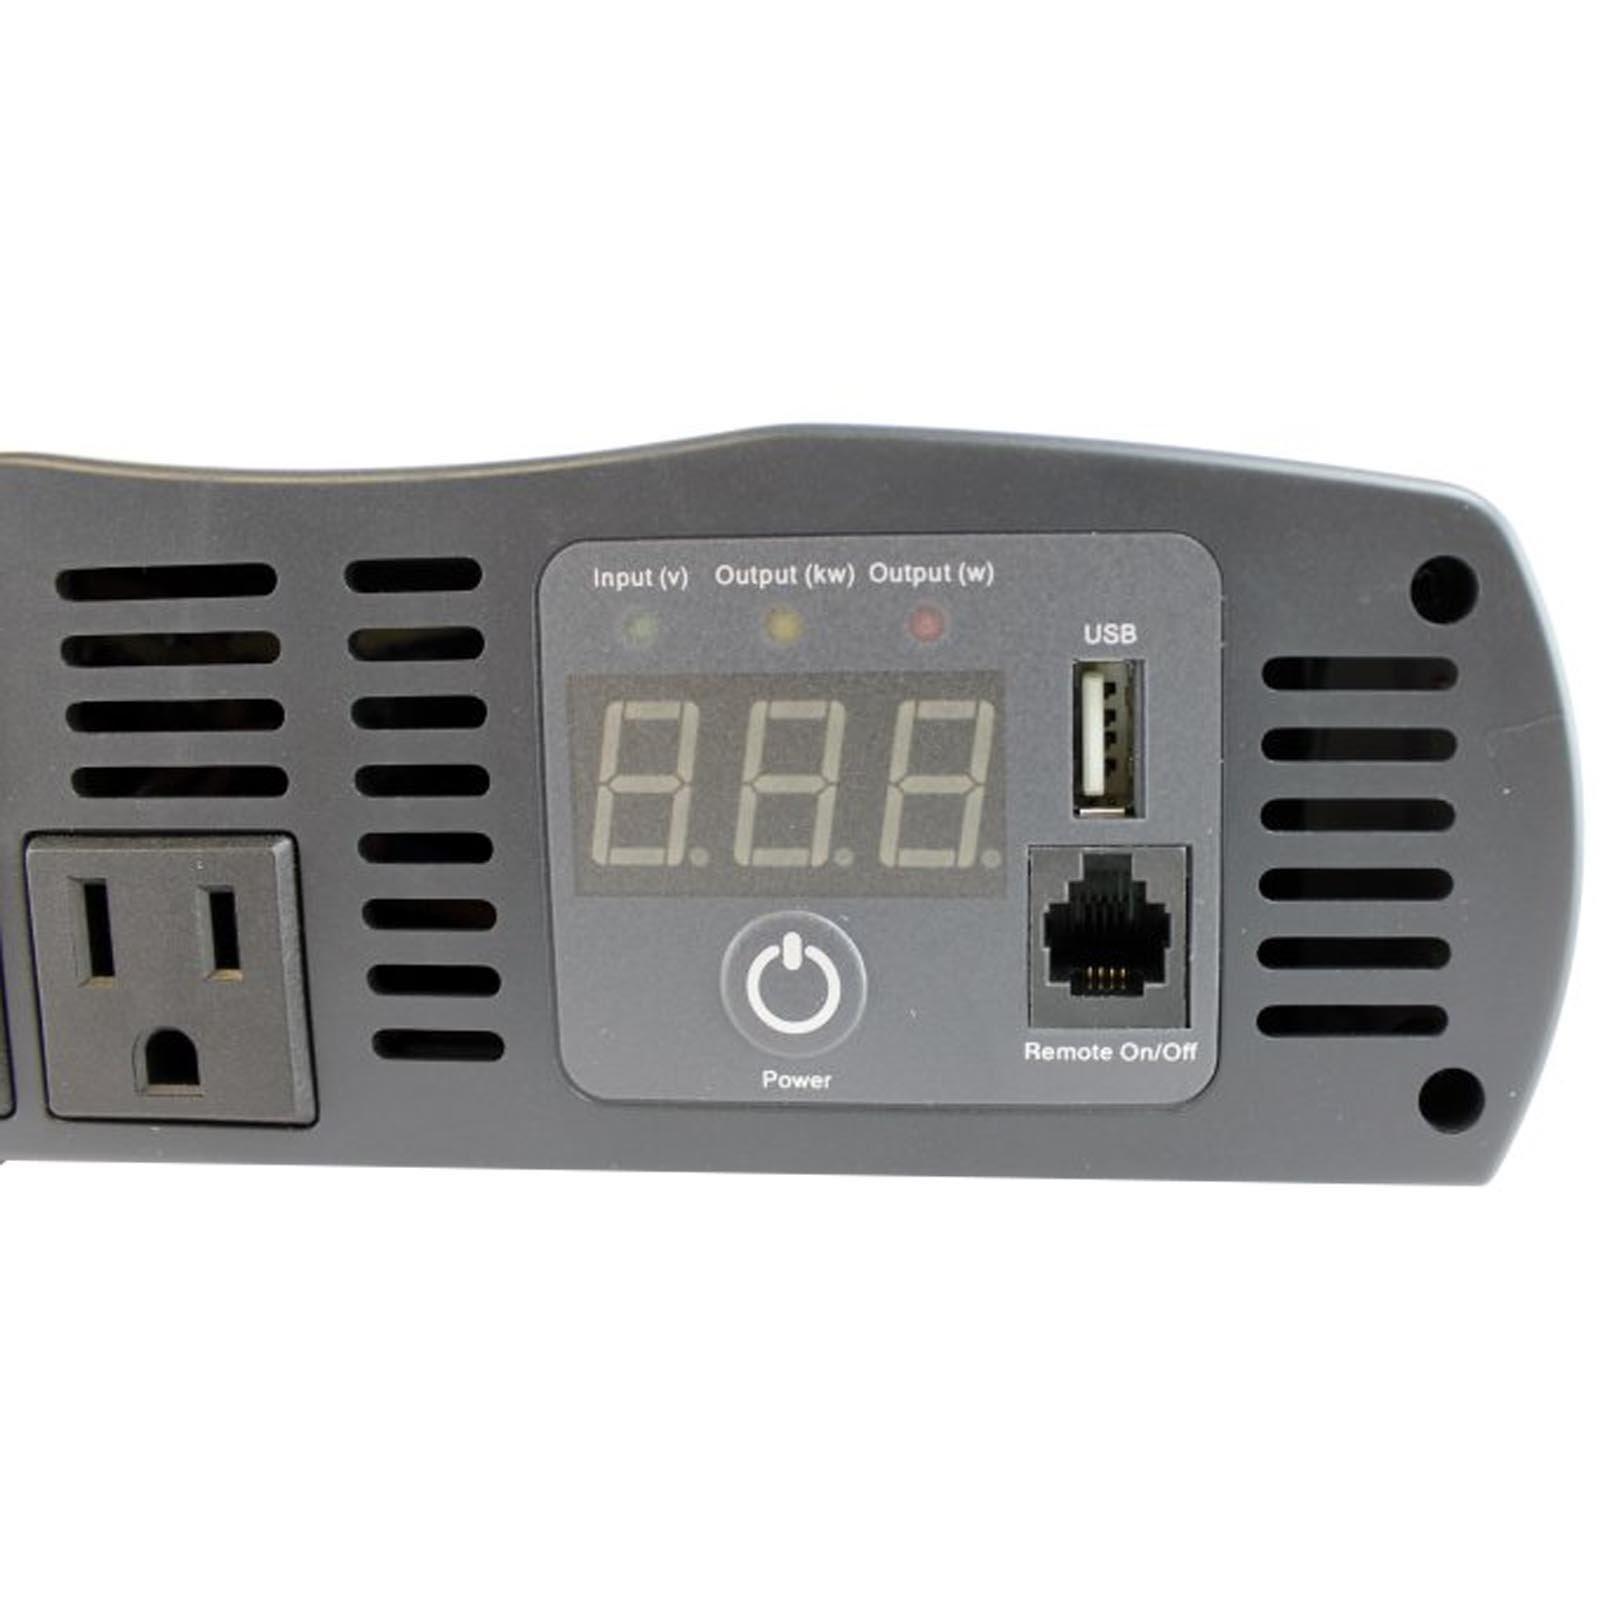 Cobra CPI 1575 1500 Watt 12 Volt DC to 120 Volt AC Power Inverter by Cobra (Image #6)